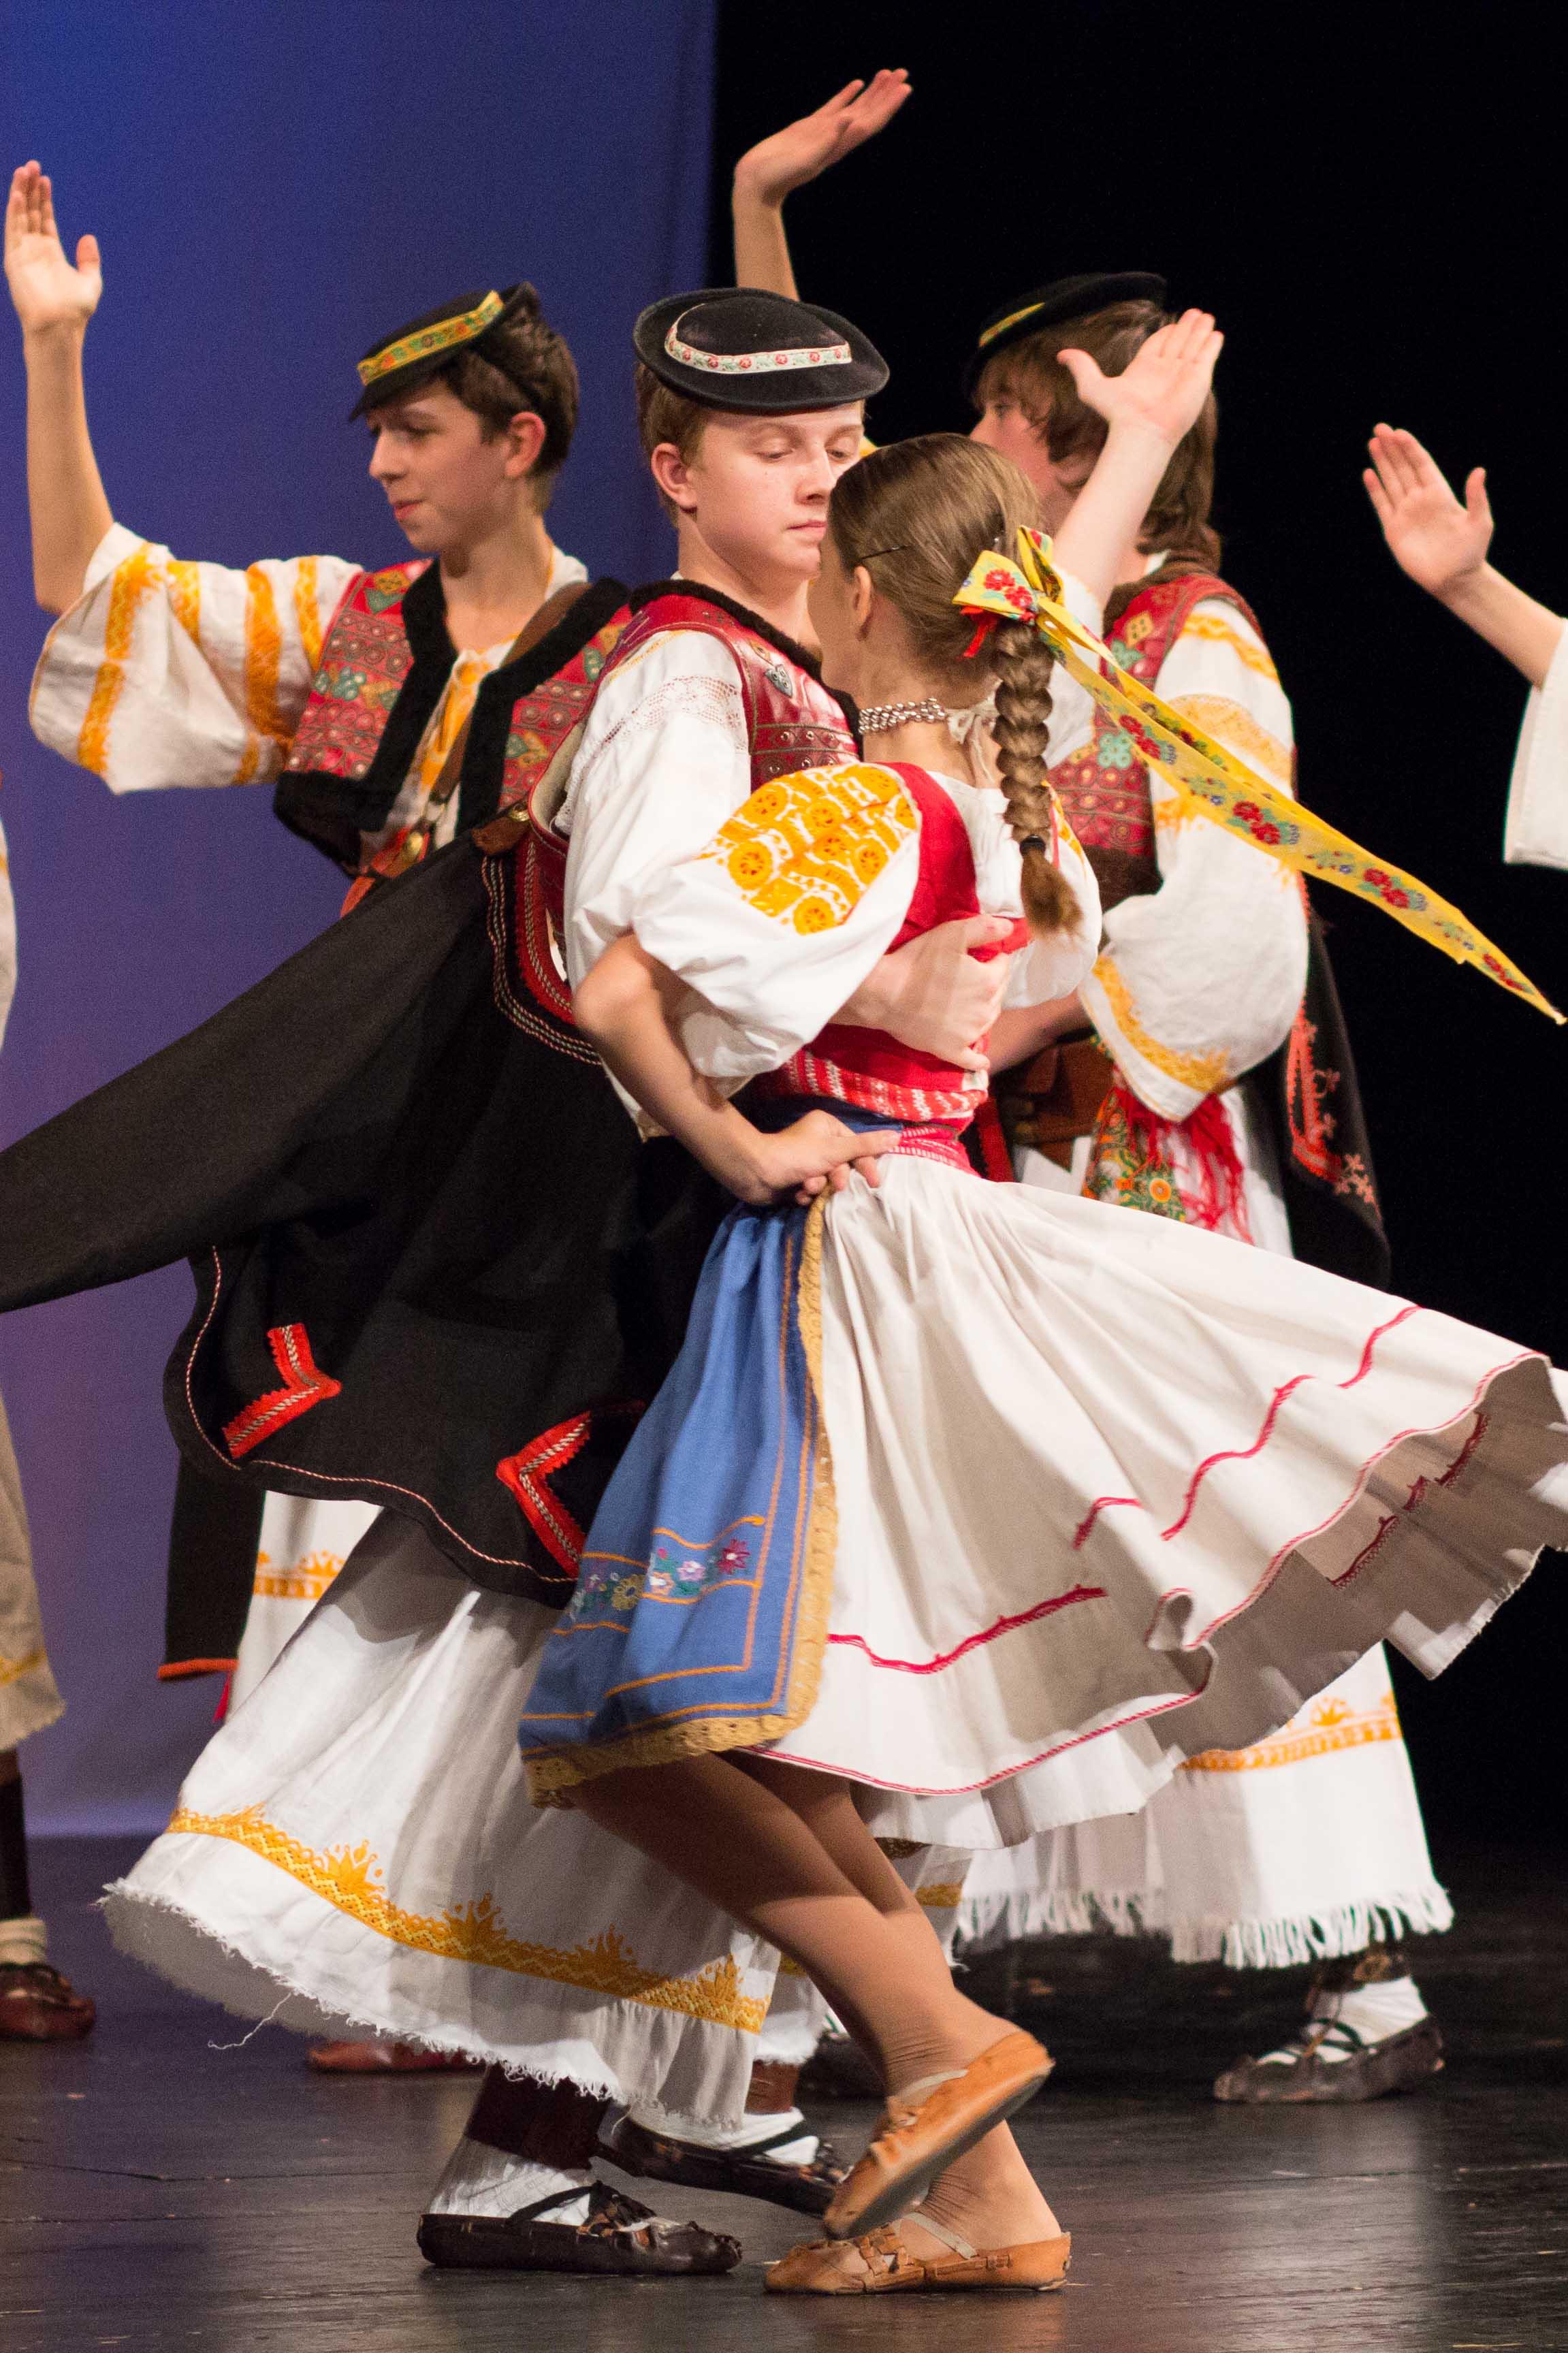 dfs-zornicka-45-rokov-divadlo-zvolen-26